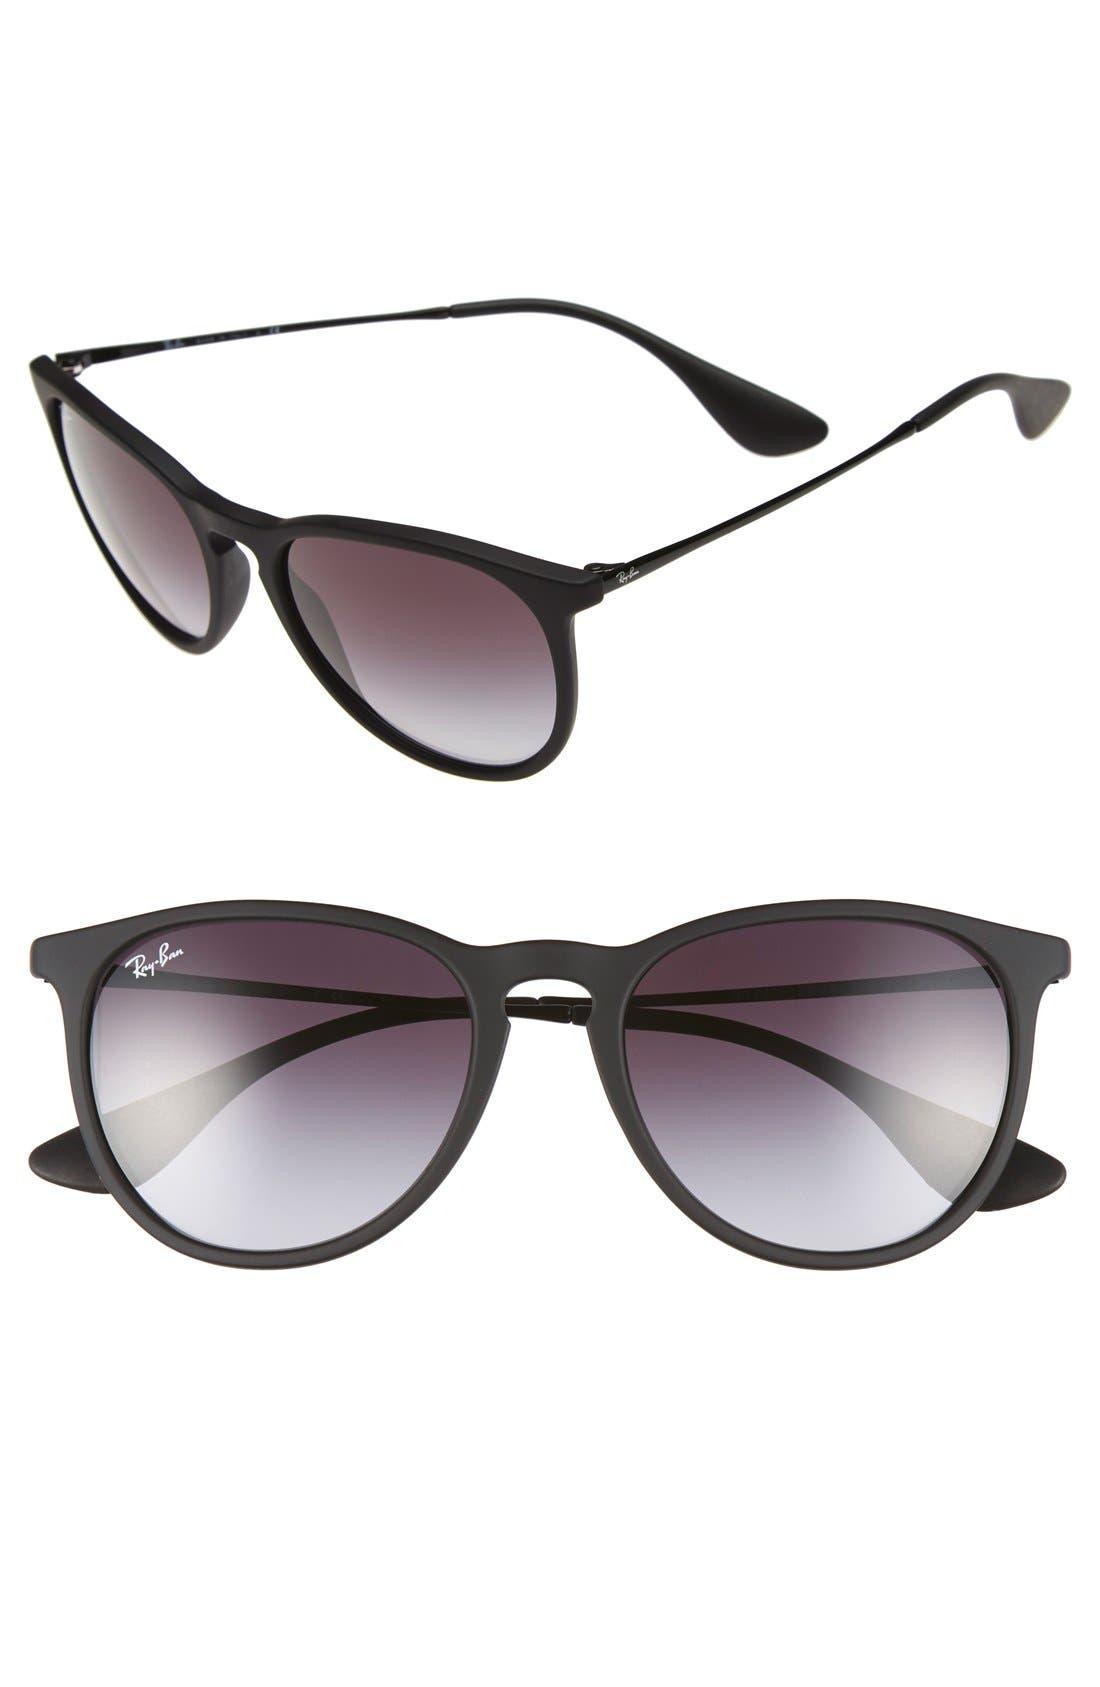 Main Image - Ray-Ban 54mm Keyhole Sunglasses